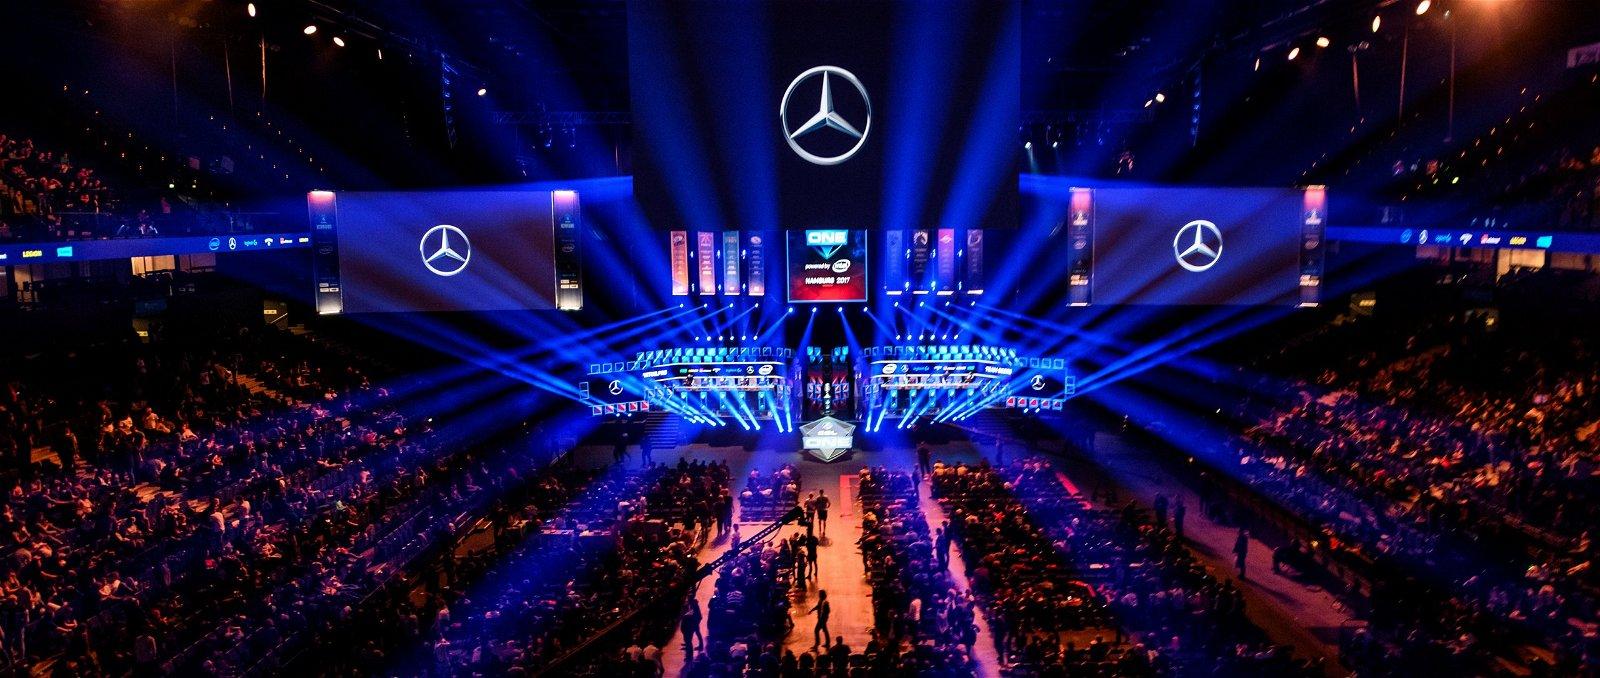 Mercedes-Benz: Esports